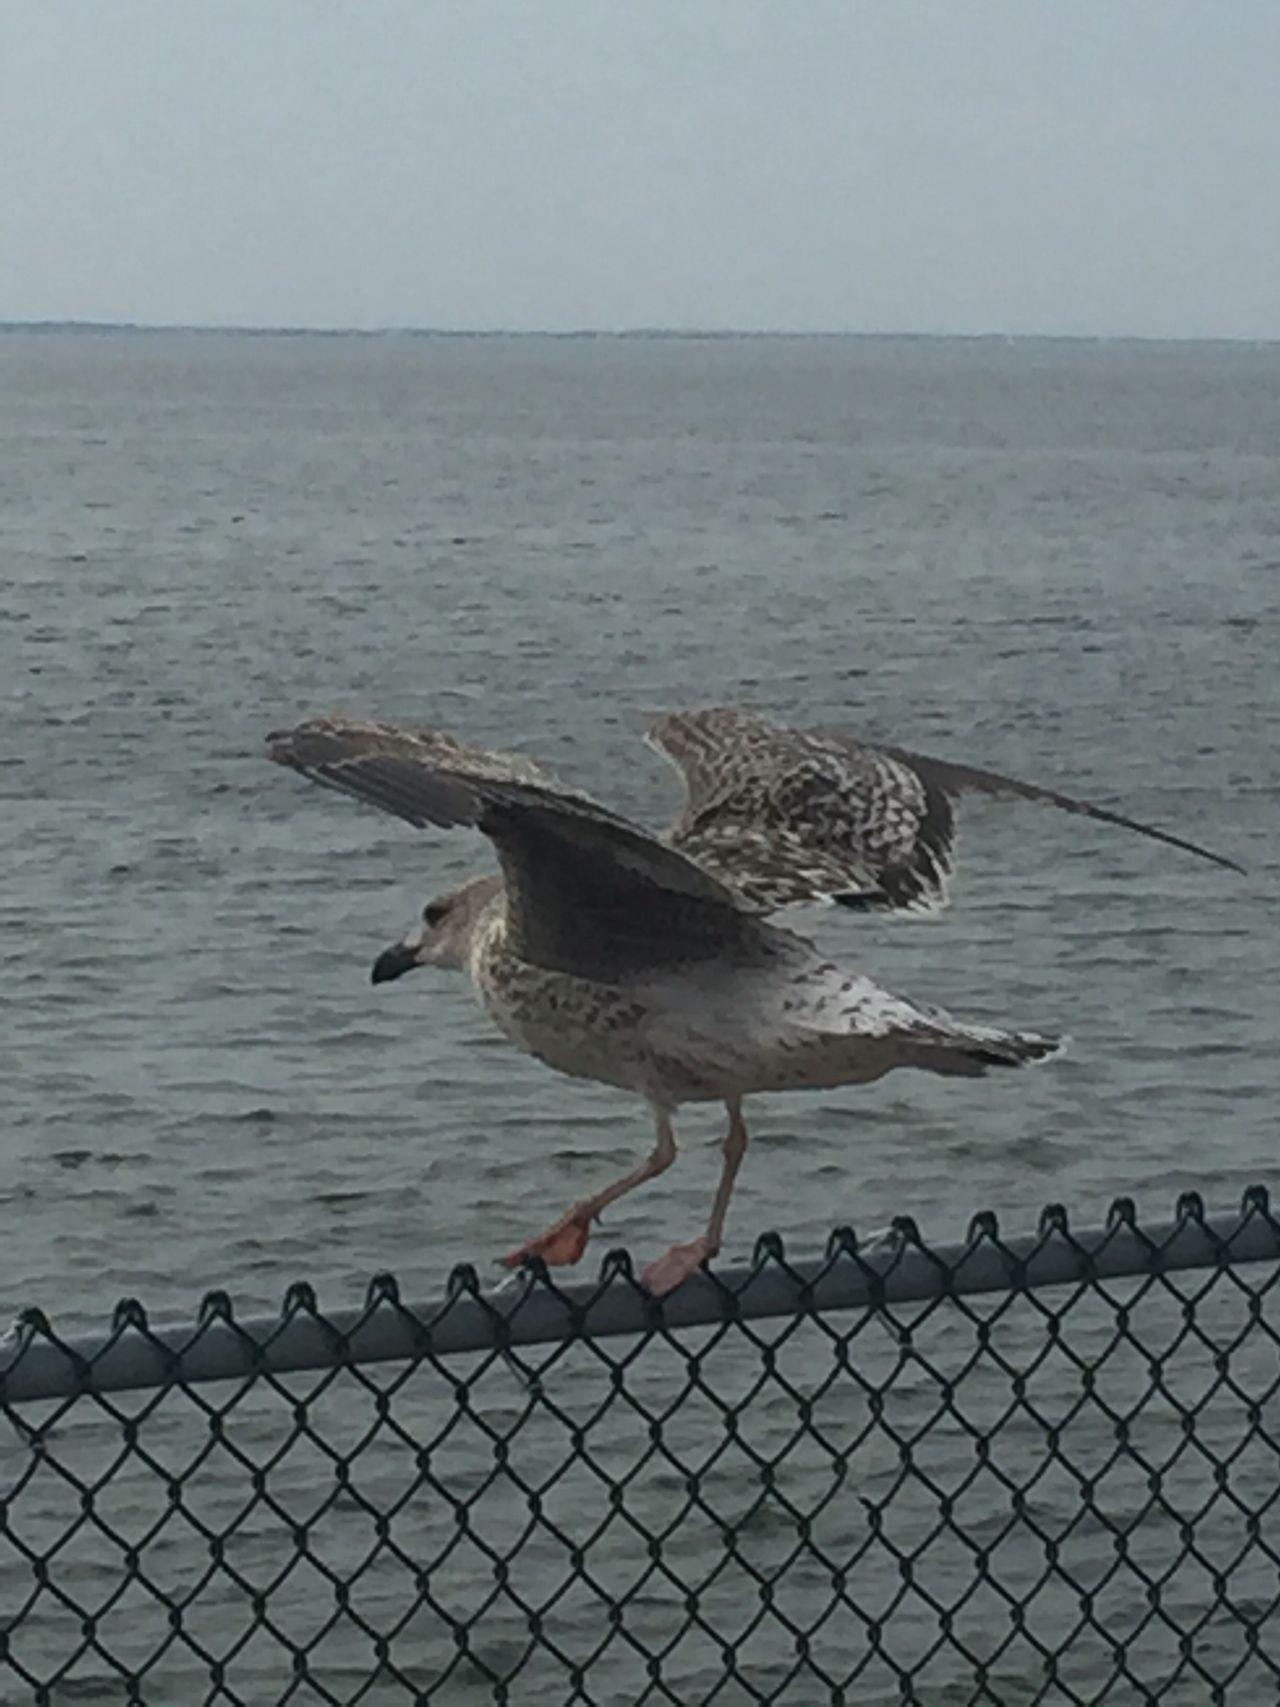 Landing or taking off? Seagulls Chesapeake Bay ChesapeakeBayBridgeTunnel